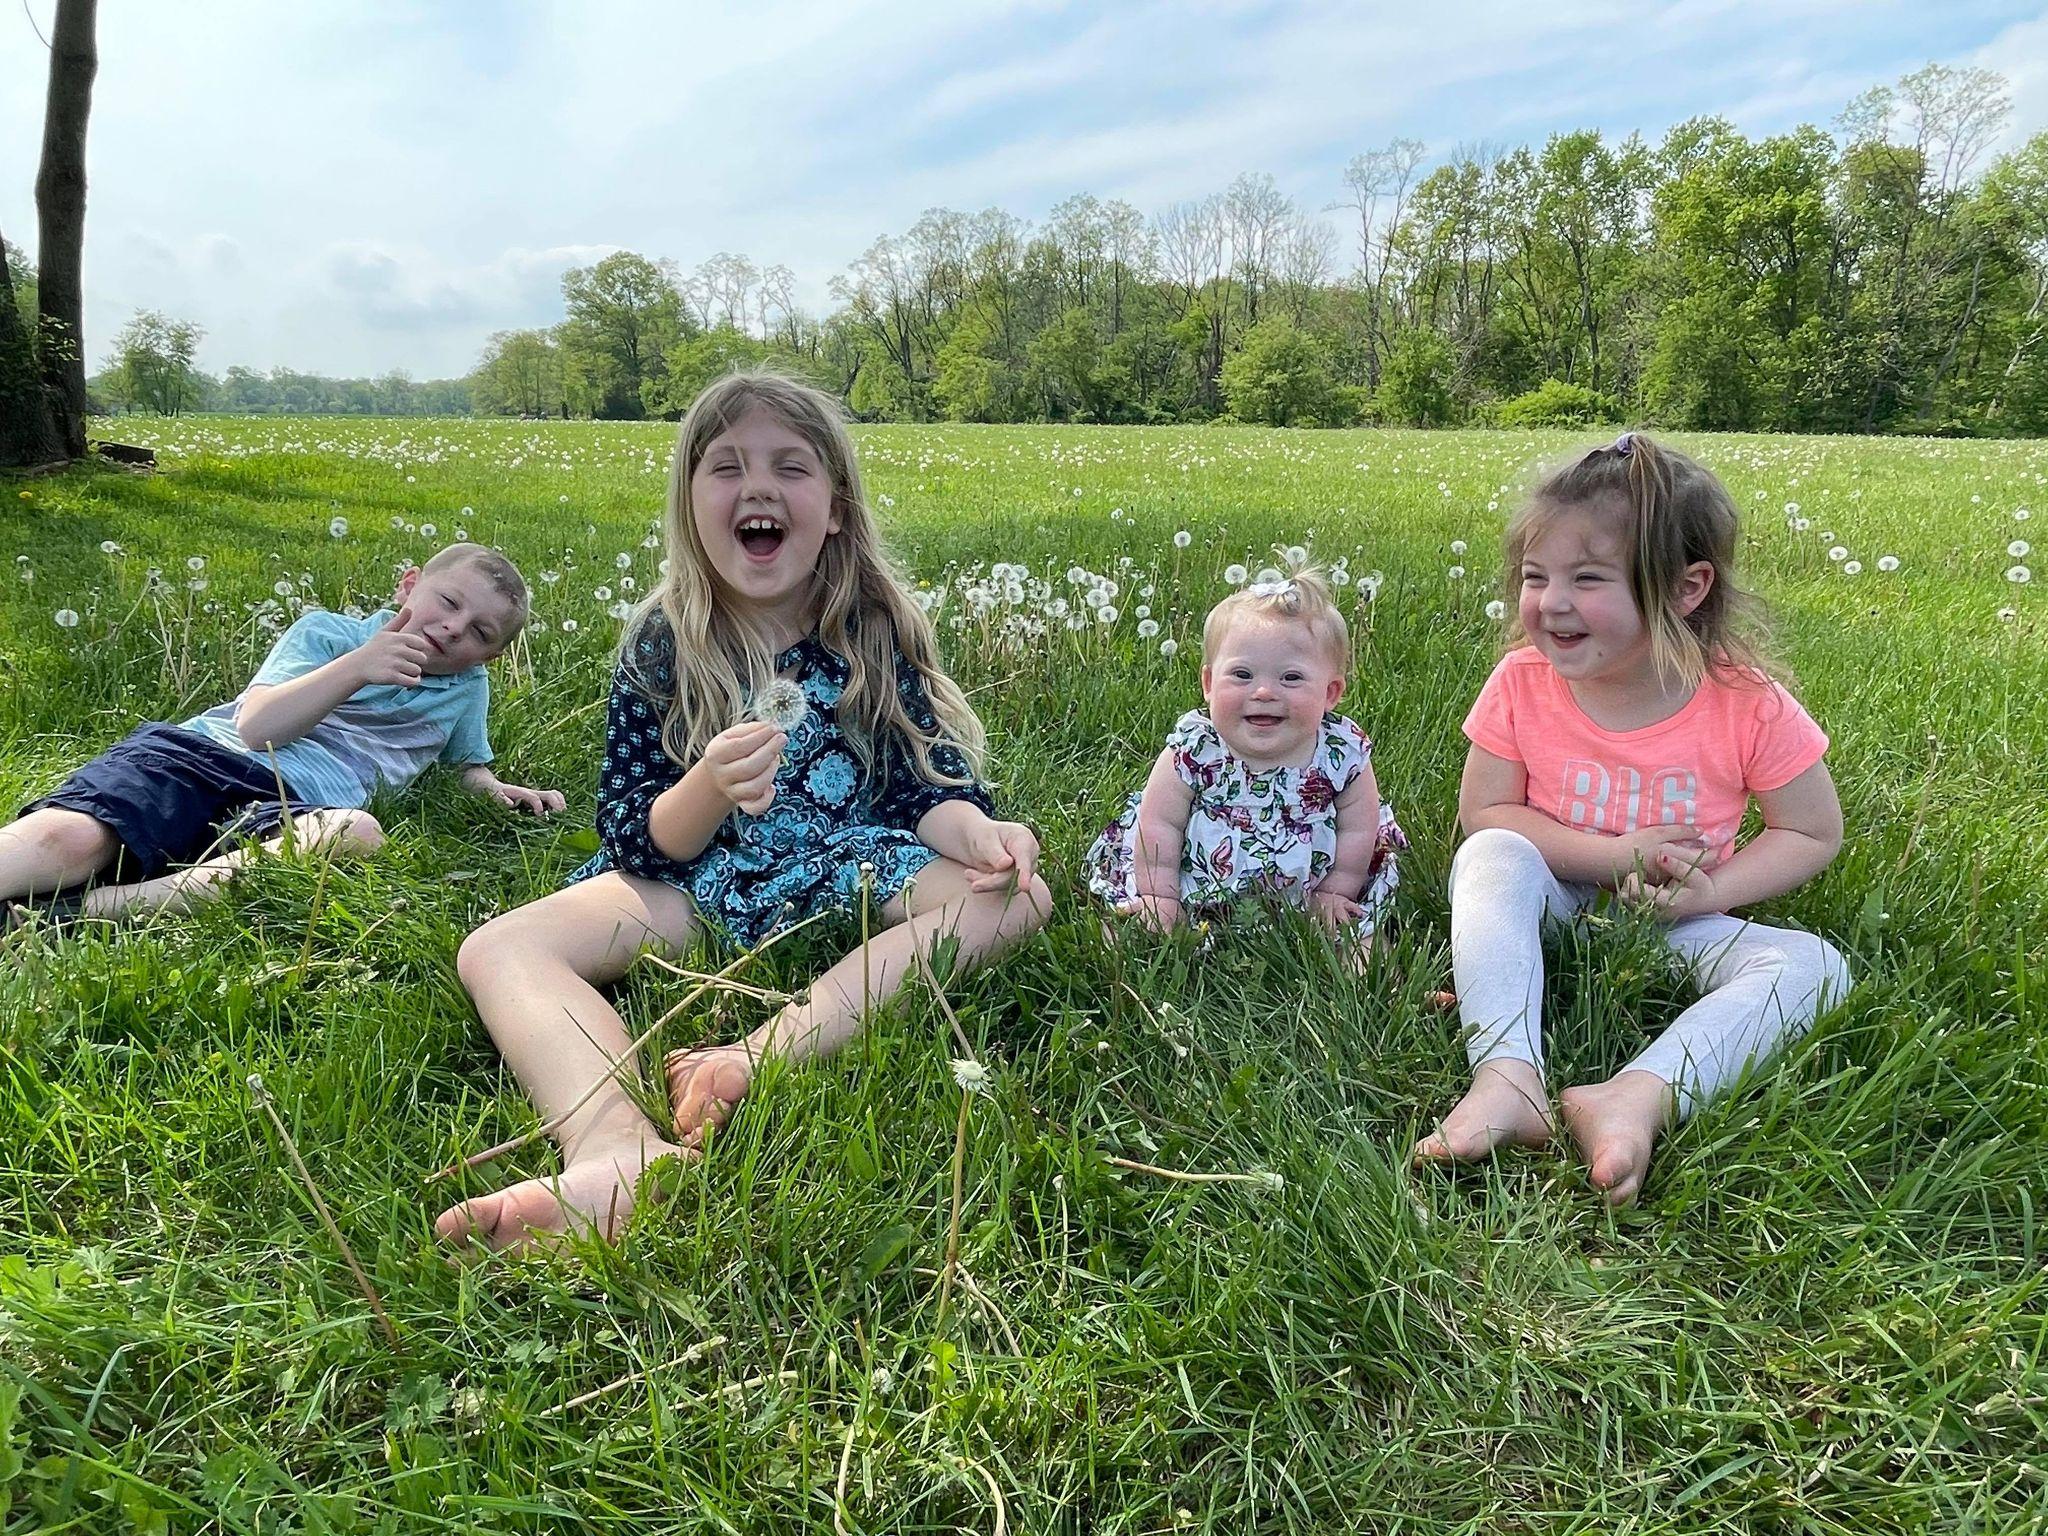 Down syndrome Awareness Month: Payton & family